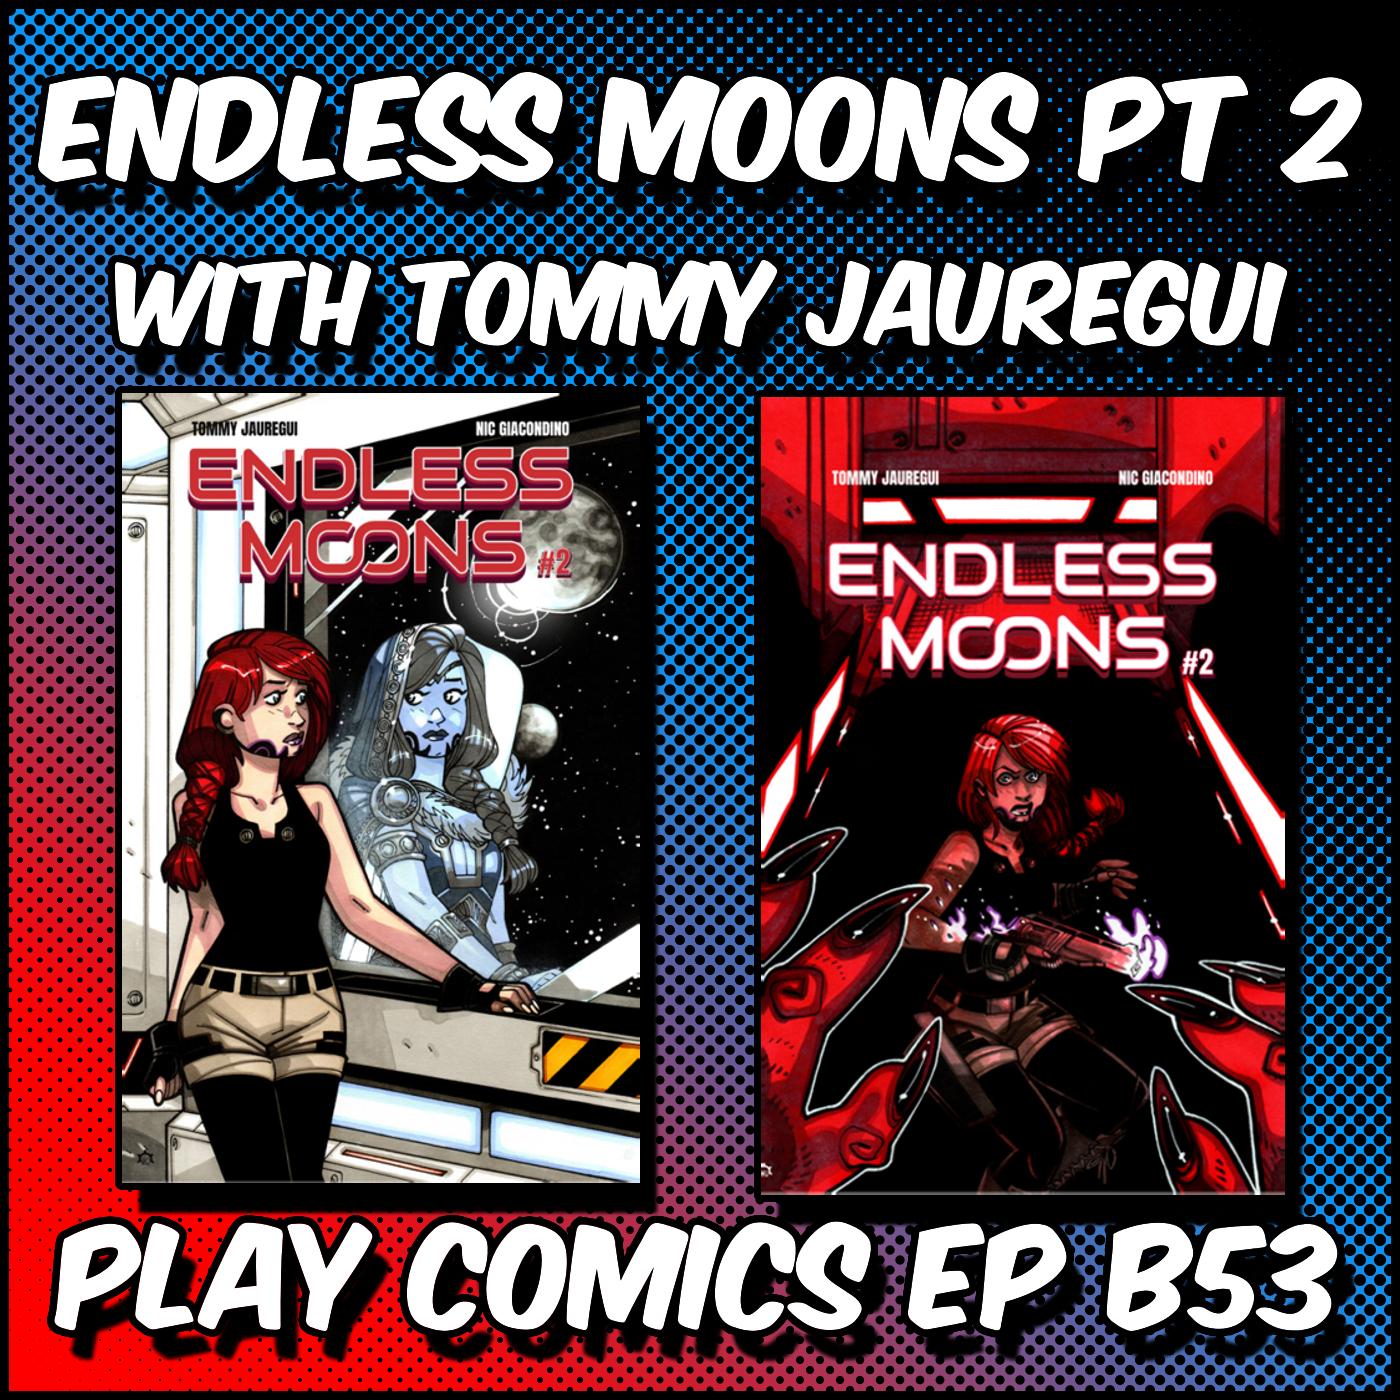 Endless Moons Pt 2 with Tommy Jauregui